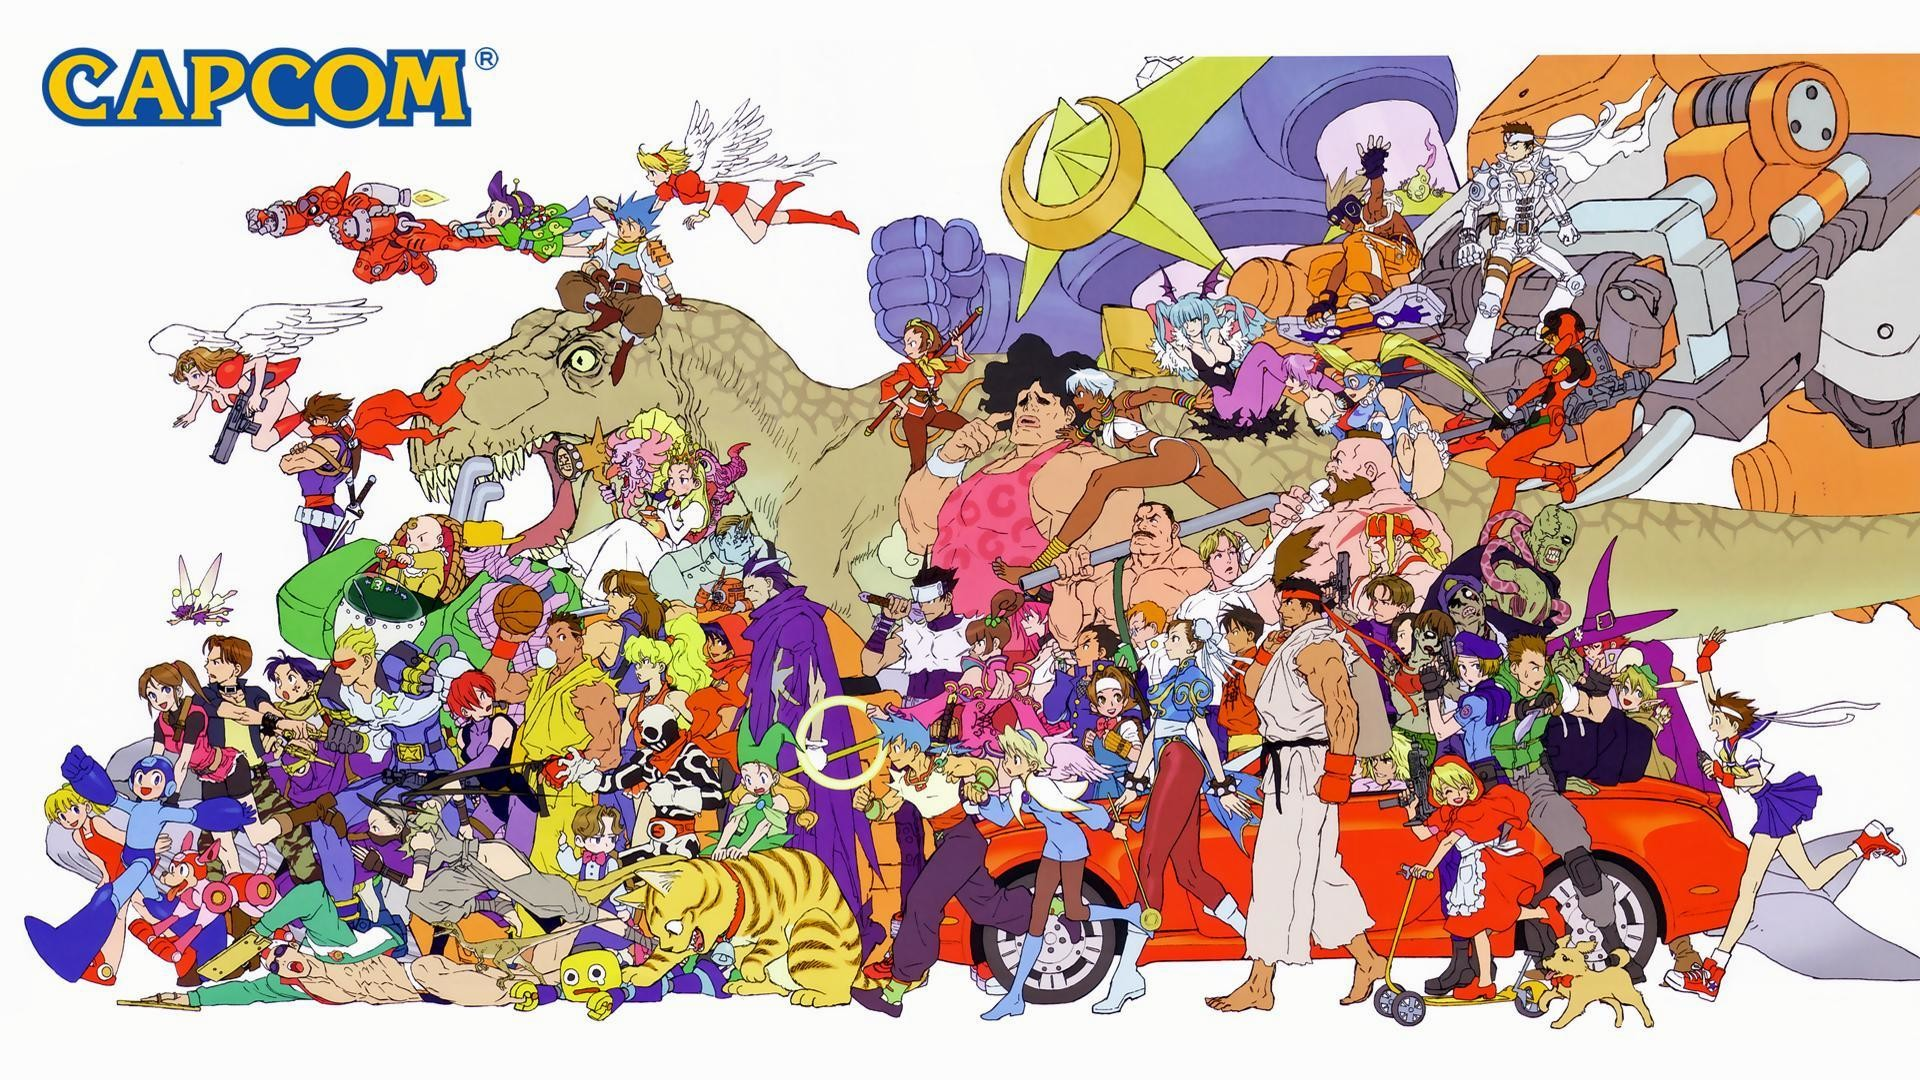 wallpaper.wiki-Capcom-Full-HD-Wallpaper-PIC-WPB0012645